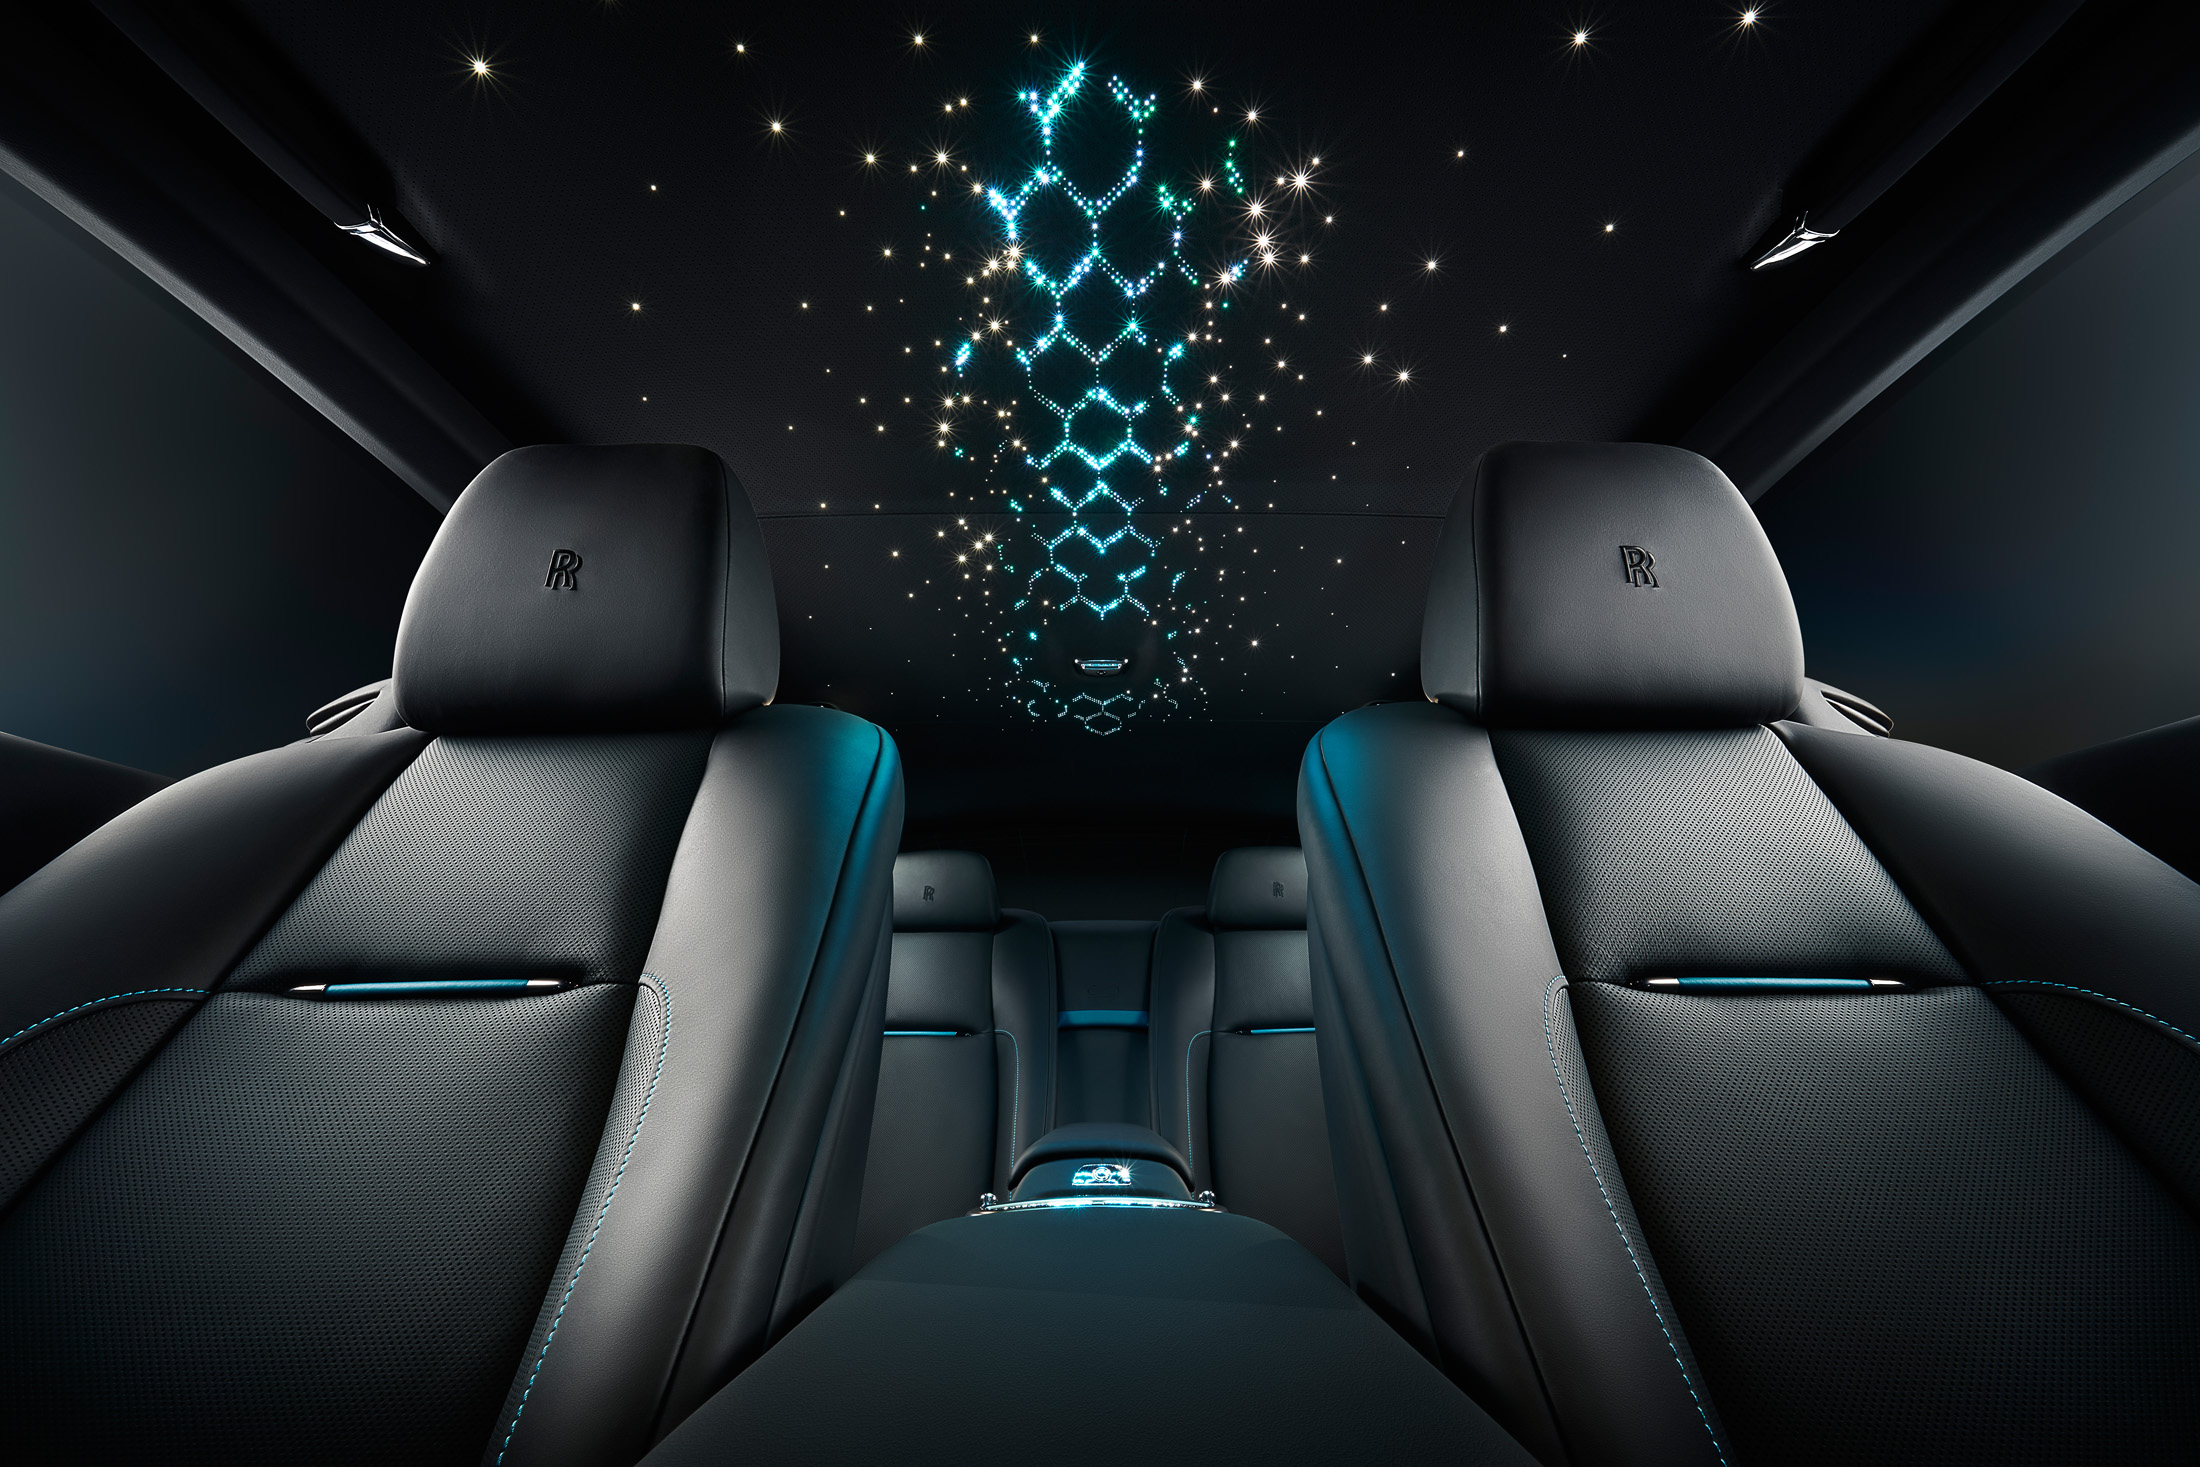 3w Rolls Royce Ghost Phantom Starlight Headliner Price